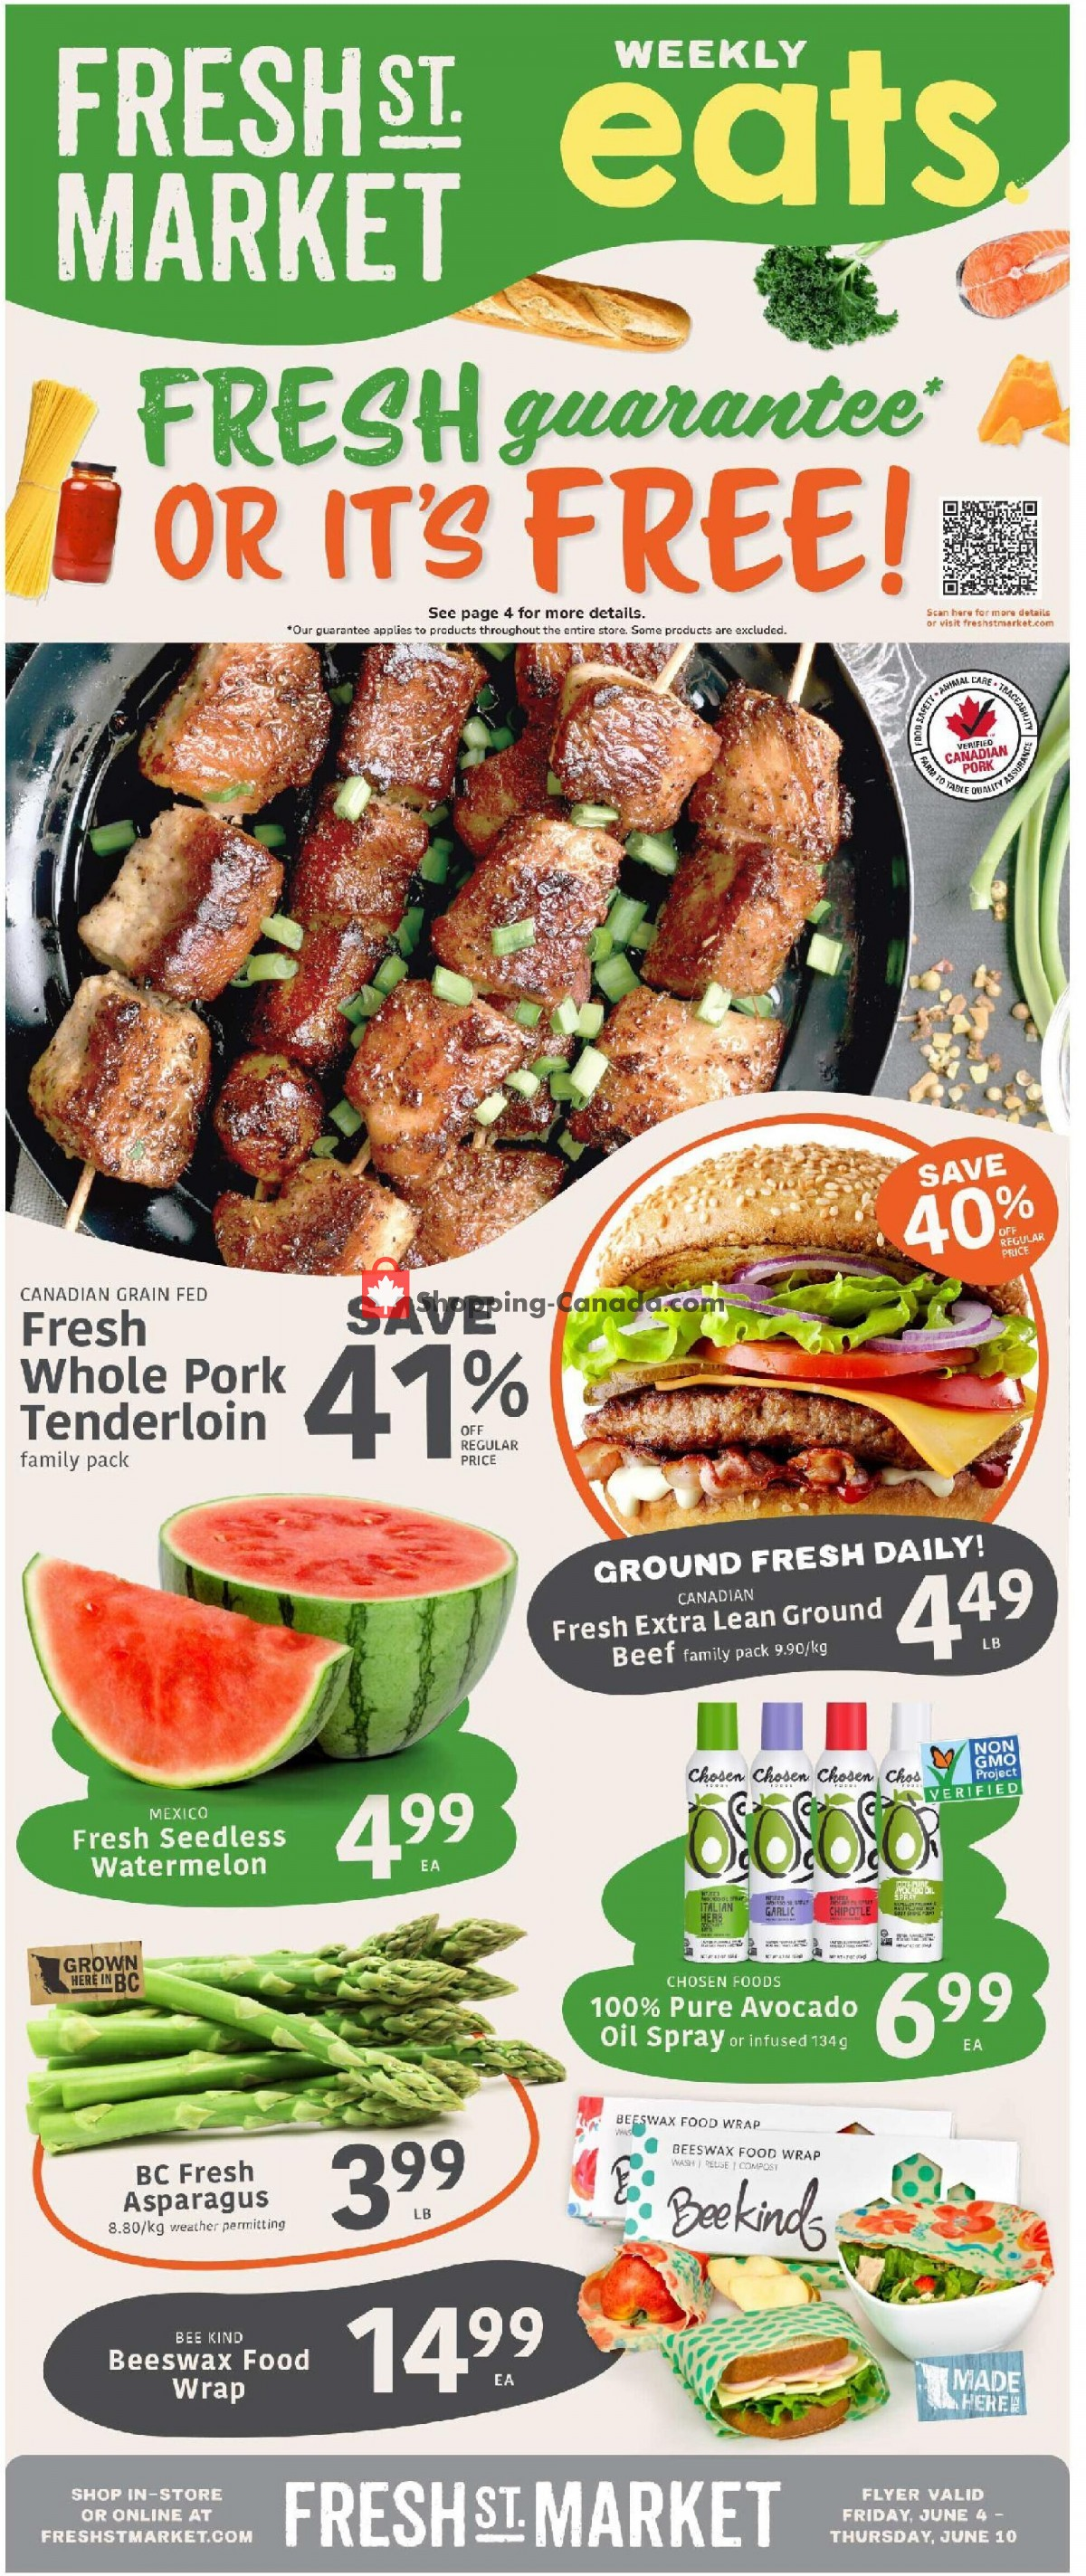 Flyer Fresh St. Market Canada - from Friday June 4, 2021 to Thursday June 10, 2021